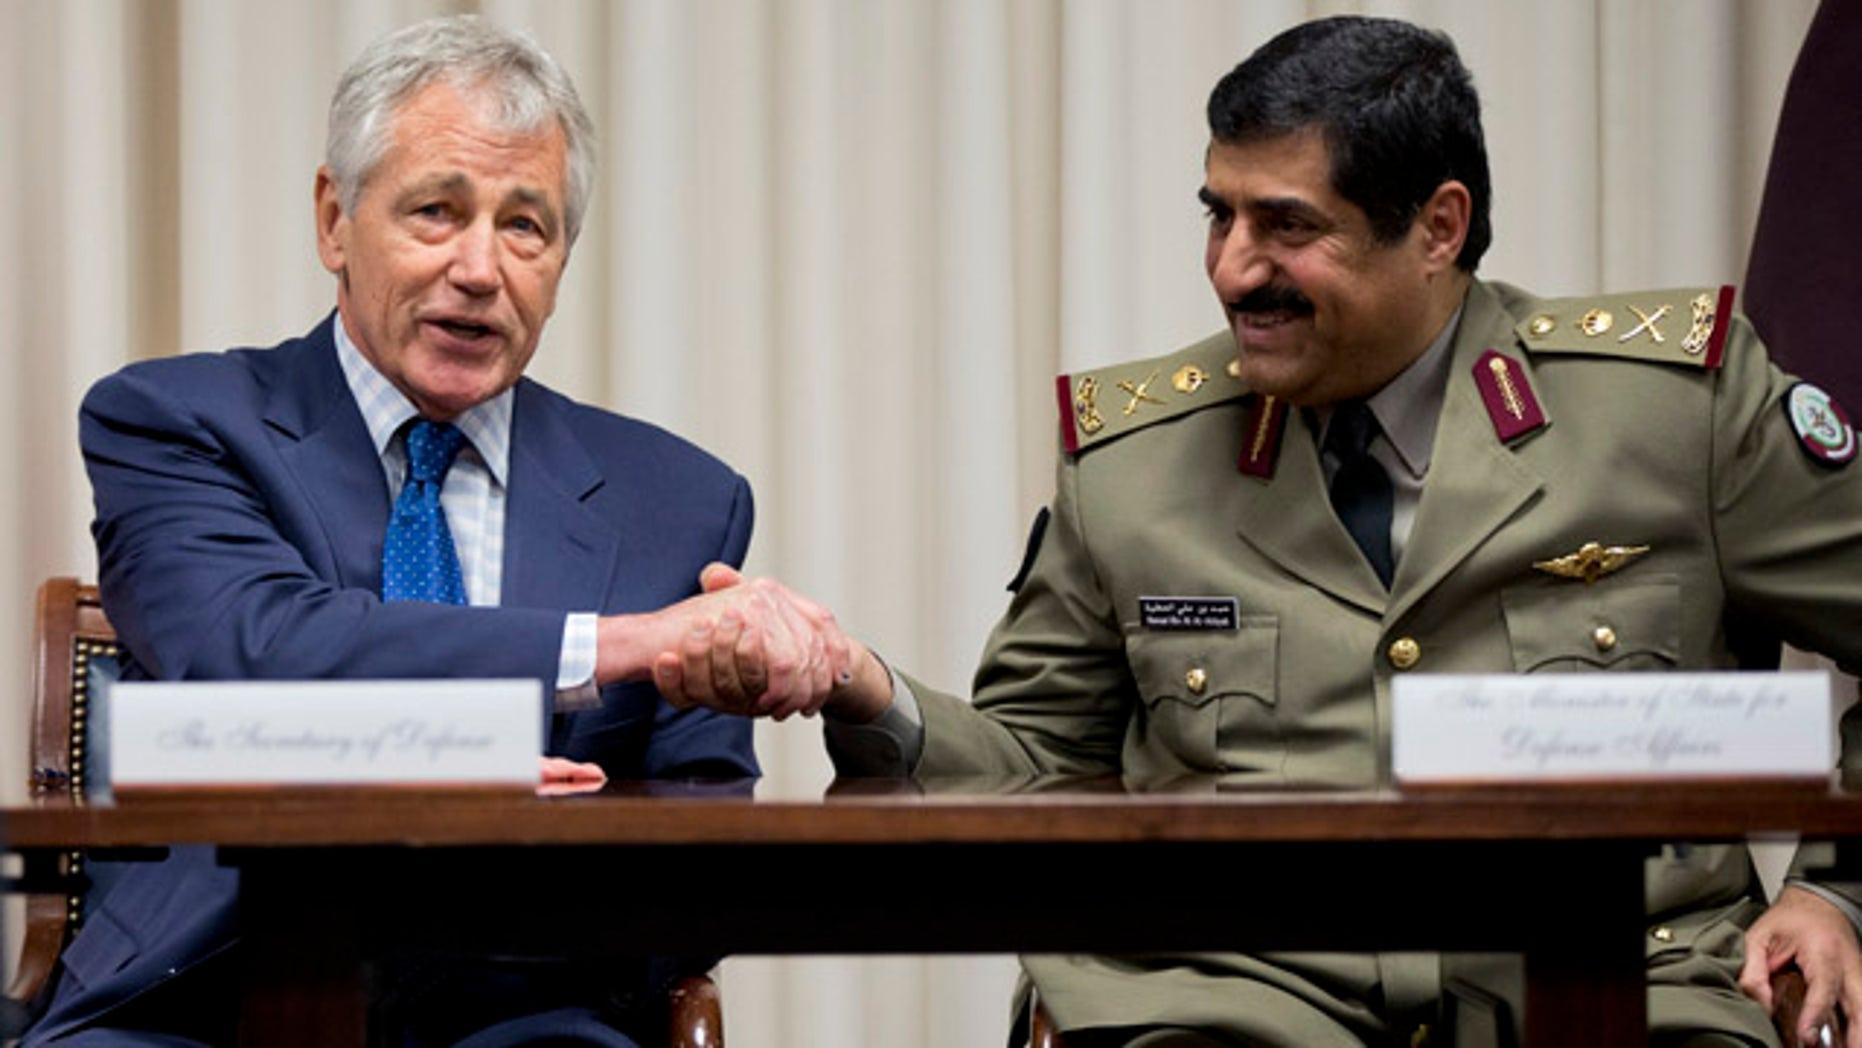 July 14, 2014: Defense Secretary Chuck Hagel, left, shakes hands with Qatari Defense Minister Hamad bin Ali al-Attiyah during a signing ceremony at the Pentagon. (AP Photo/Manuel Balce Ceneta)